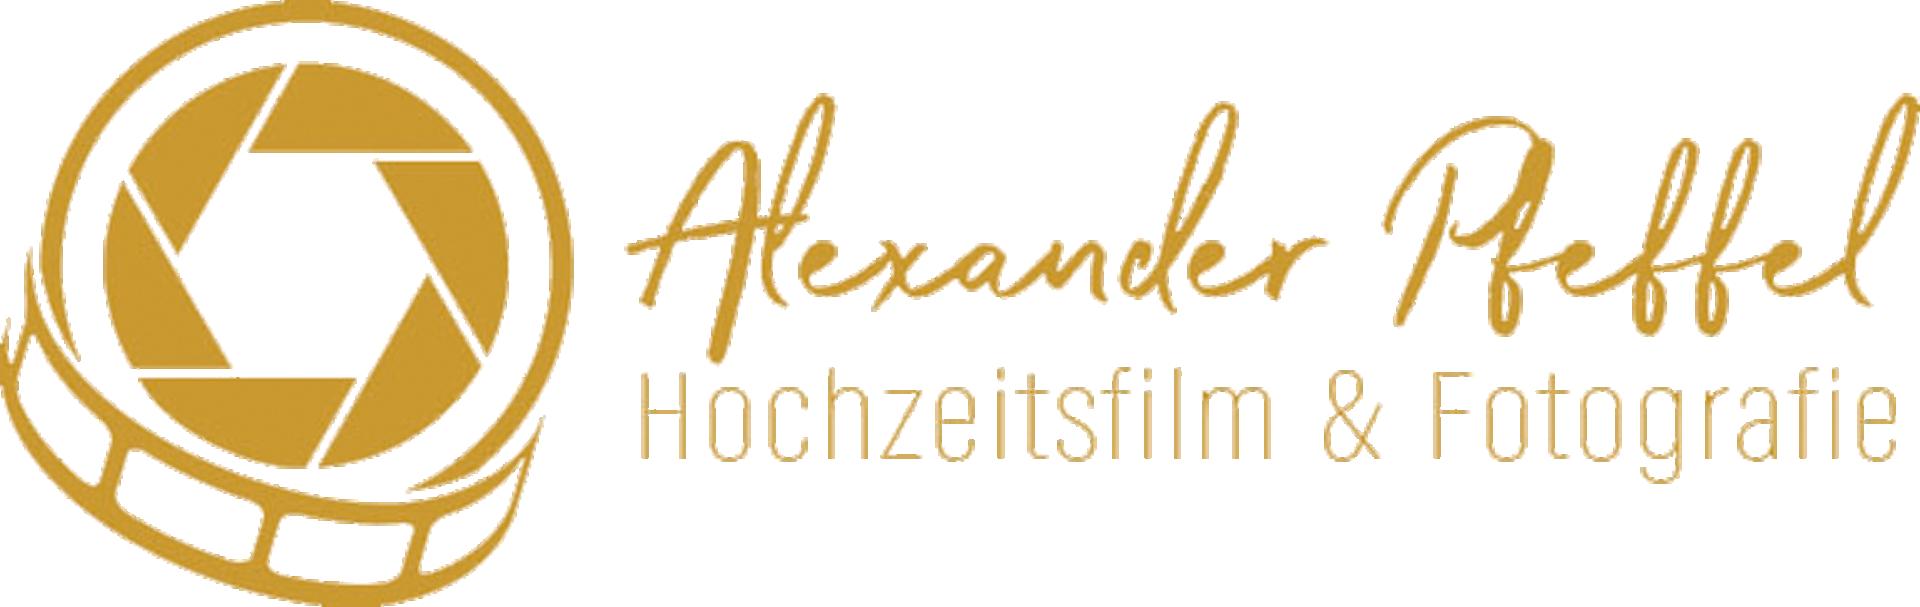 2020-05-18_-_logo-alexander-pfeffel_-_GOLD-quer_-_hochzeitsfilm-fotografieJPG-100